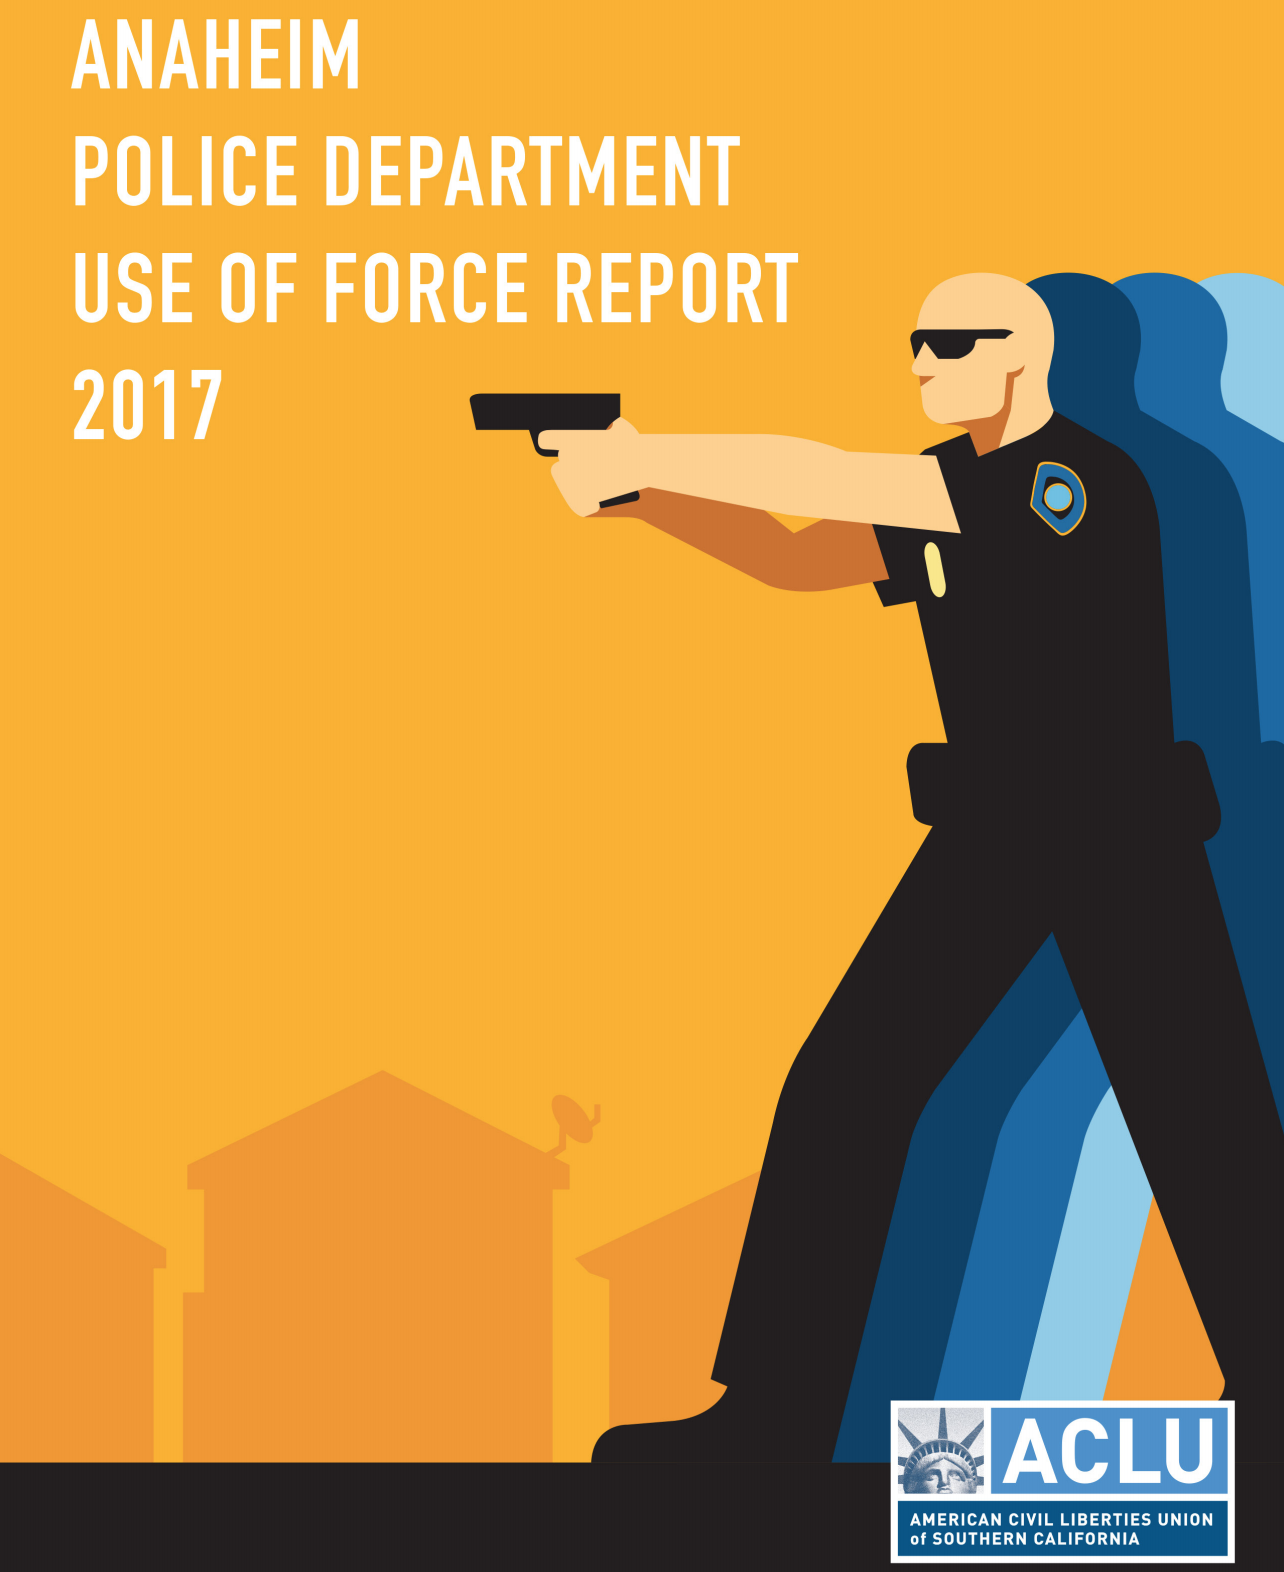 Anaheim Police Ninth Deadliest - OCCORD